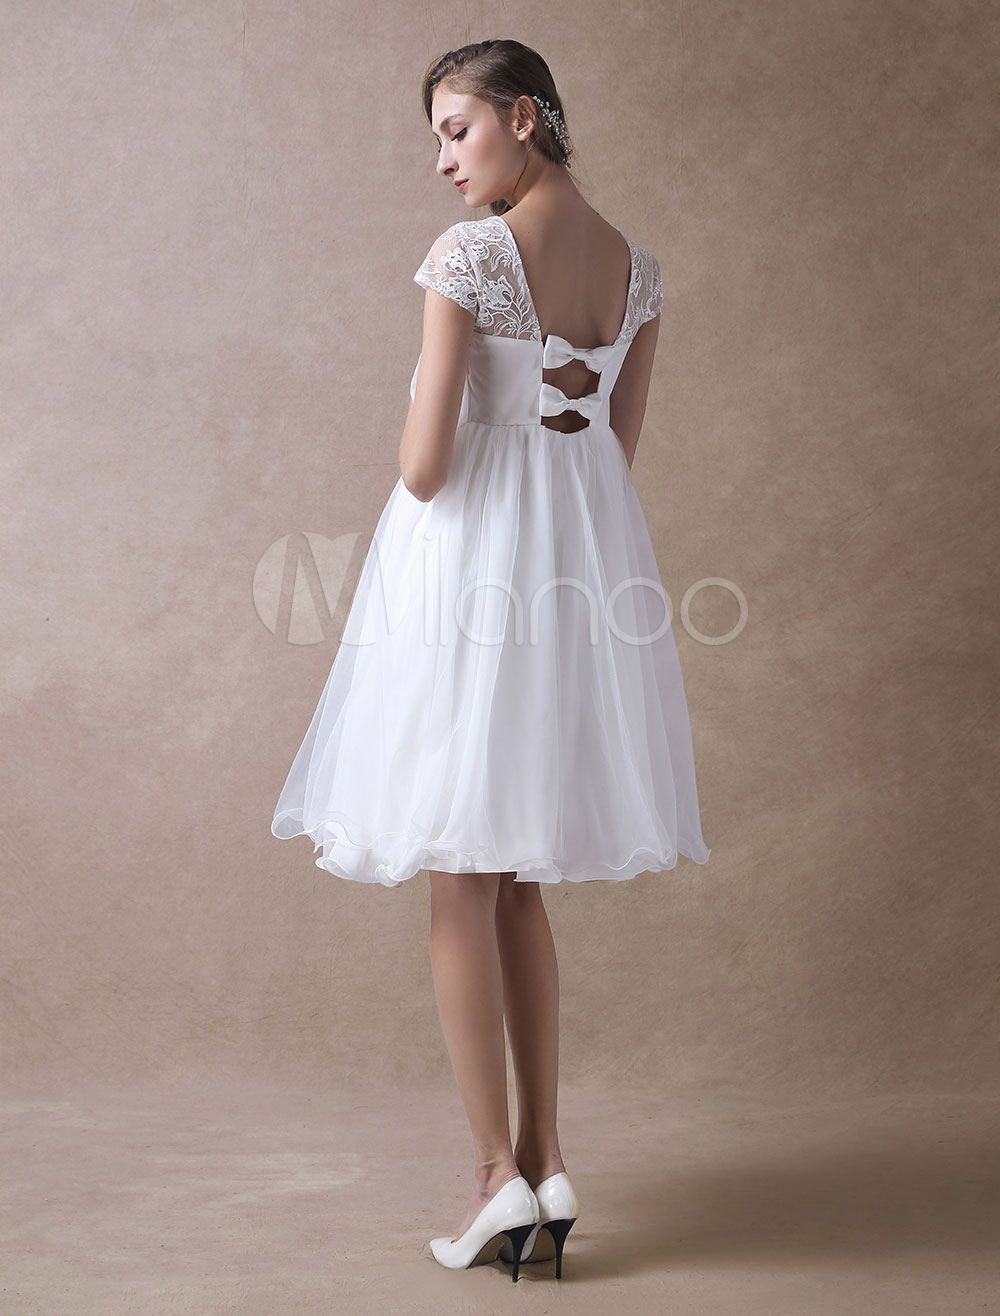 Simple Wedding Dresses Short Empire Waist Lace Tulle Cap